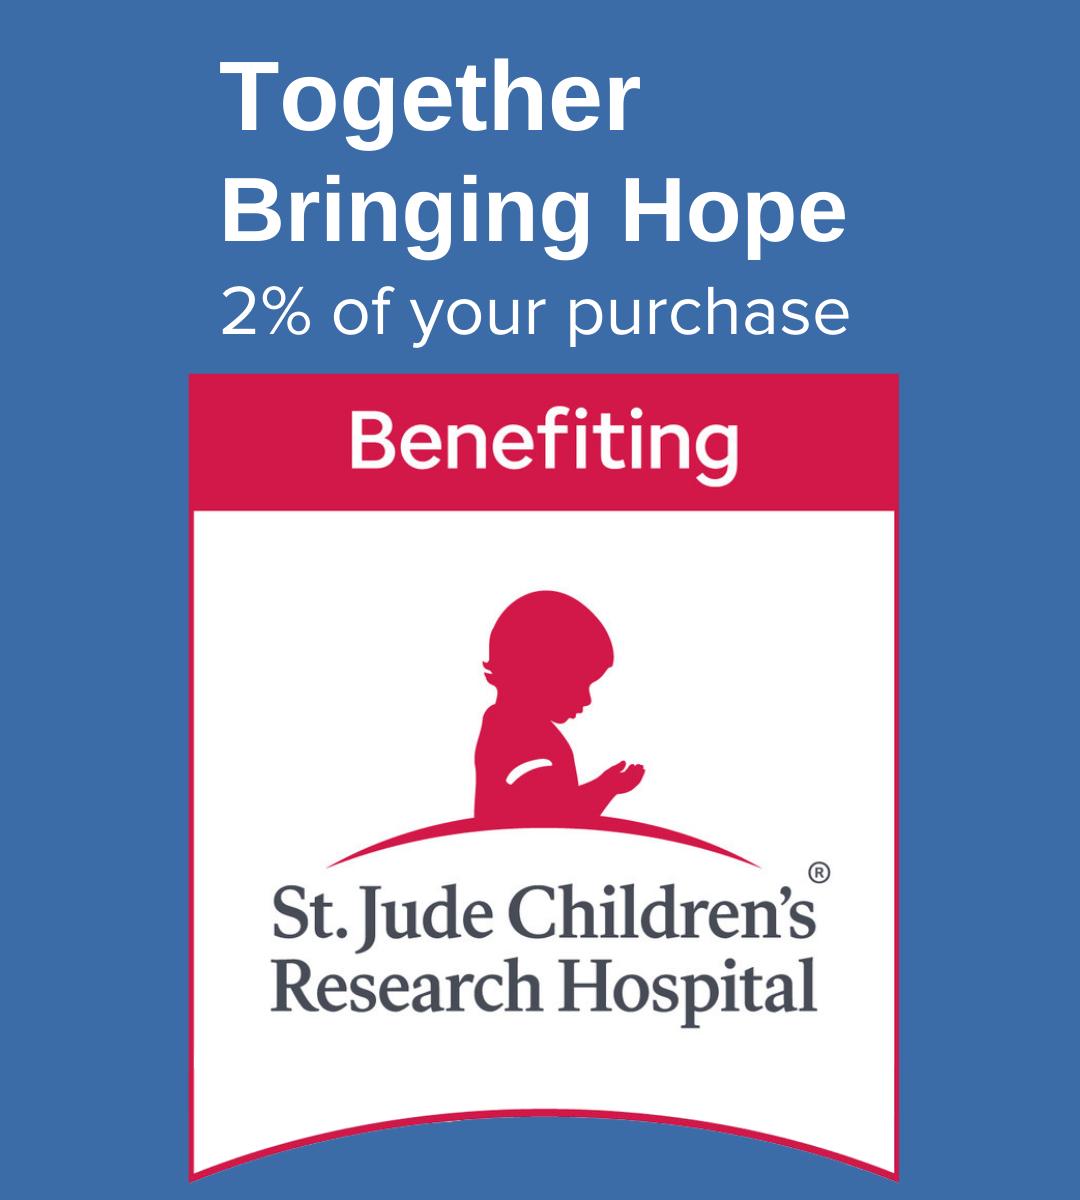 St. Jude Children's Hospital Partnership